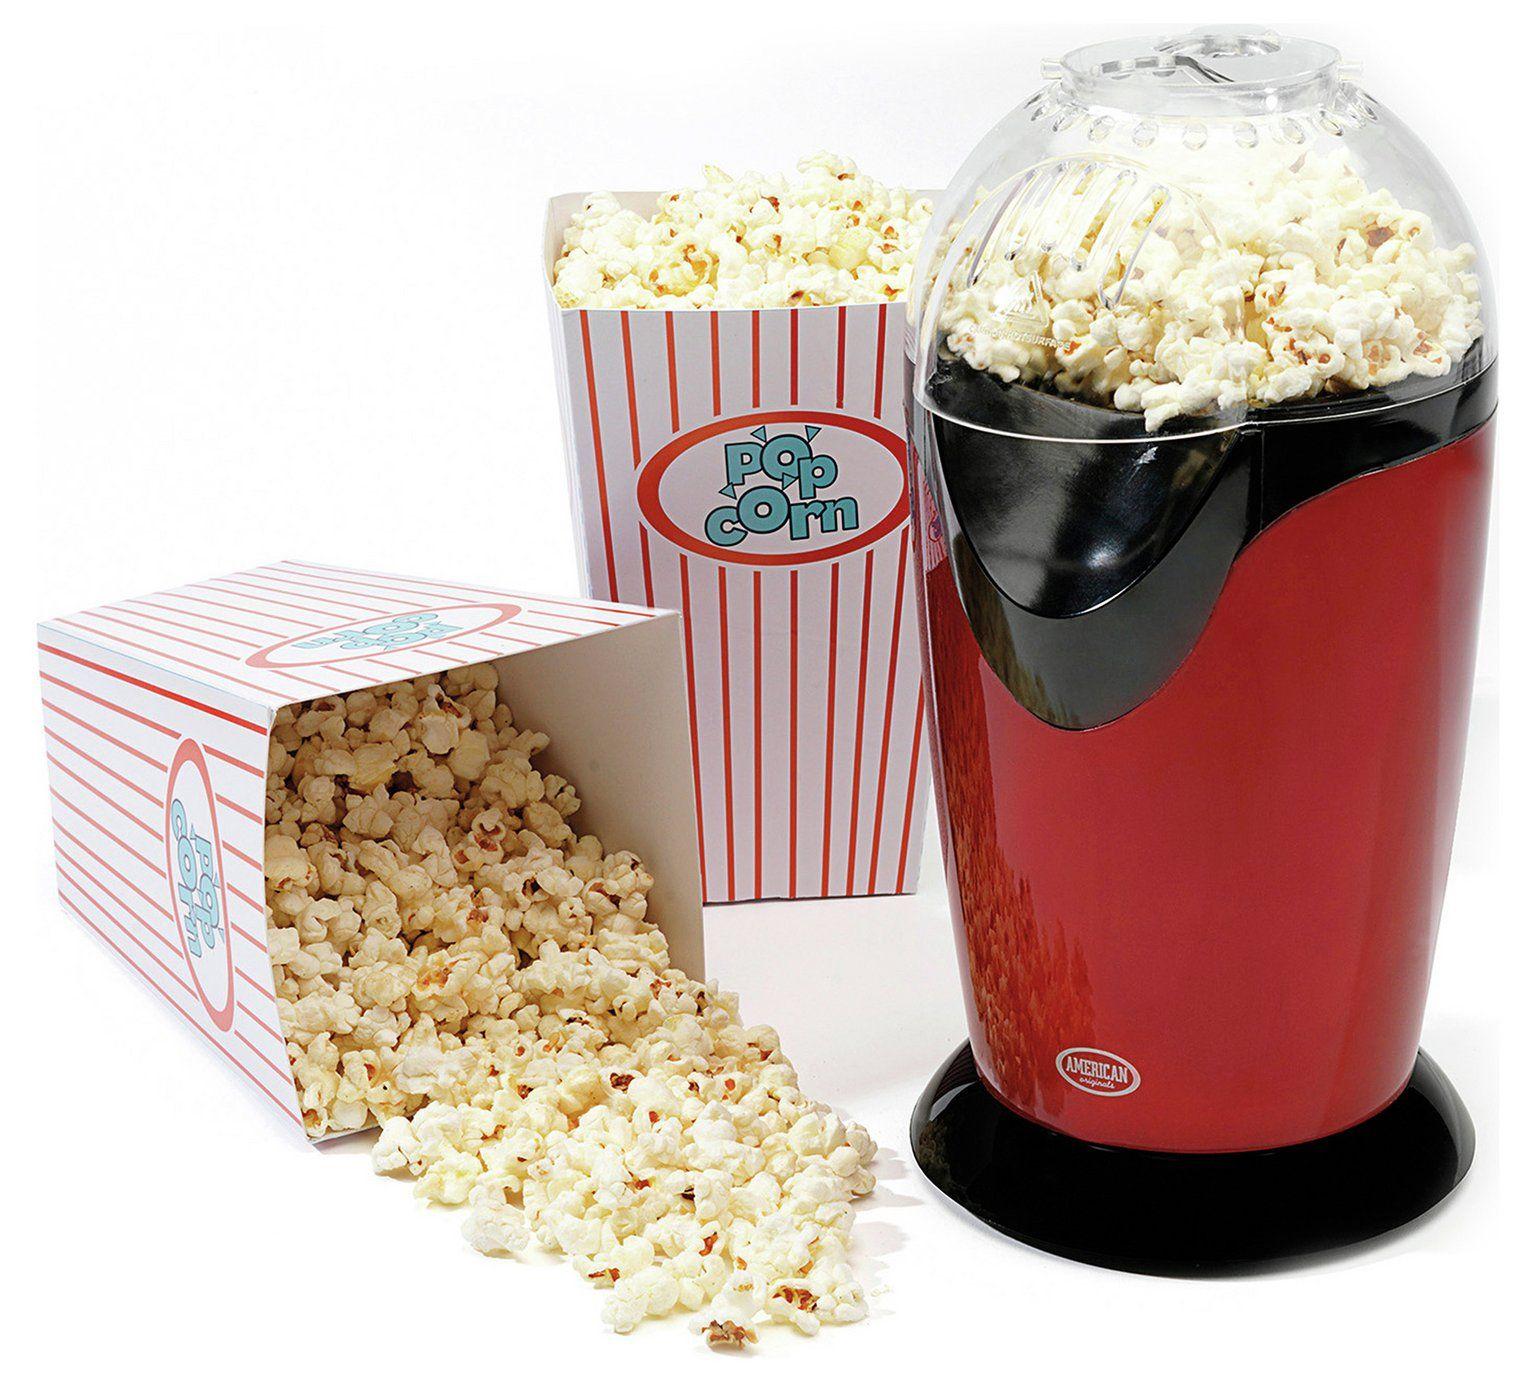 American Originals Popcorn Maker | Air popcorn maker ...